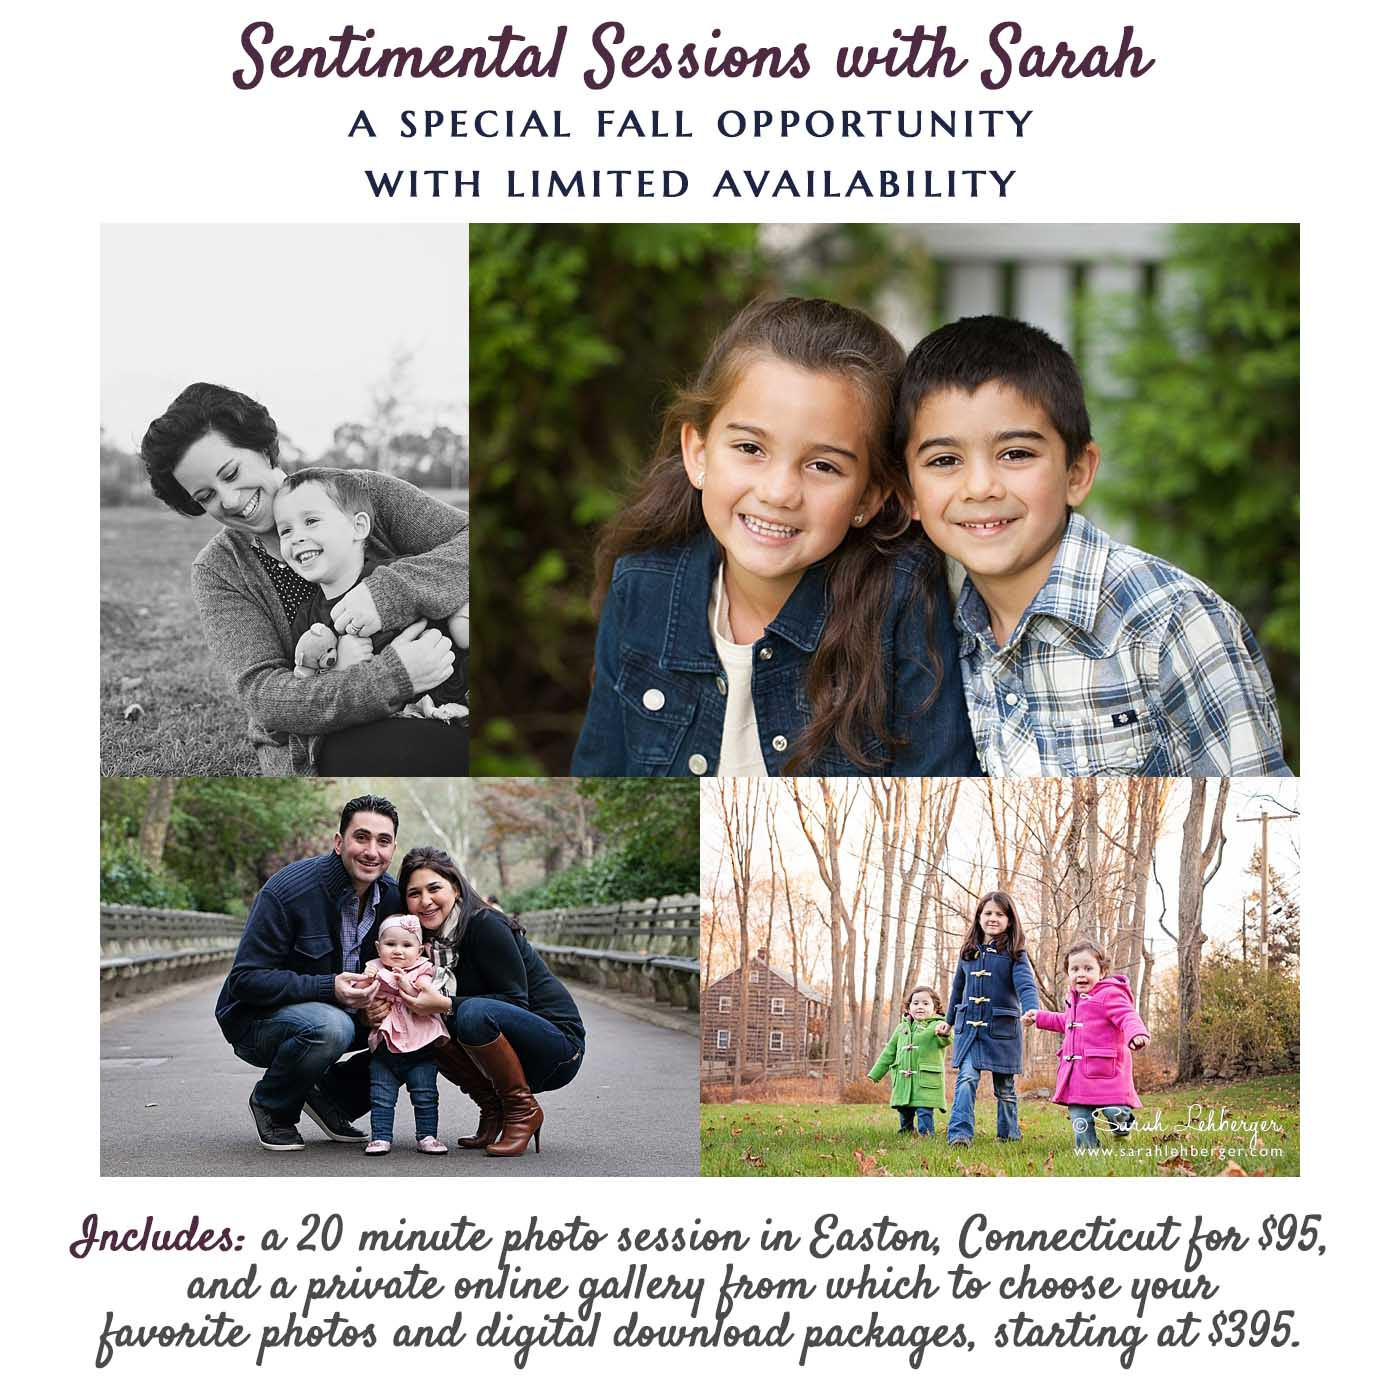 sentimental-photo-sessions-easton-connecticut.jpg